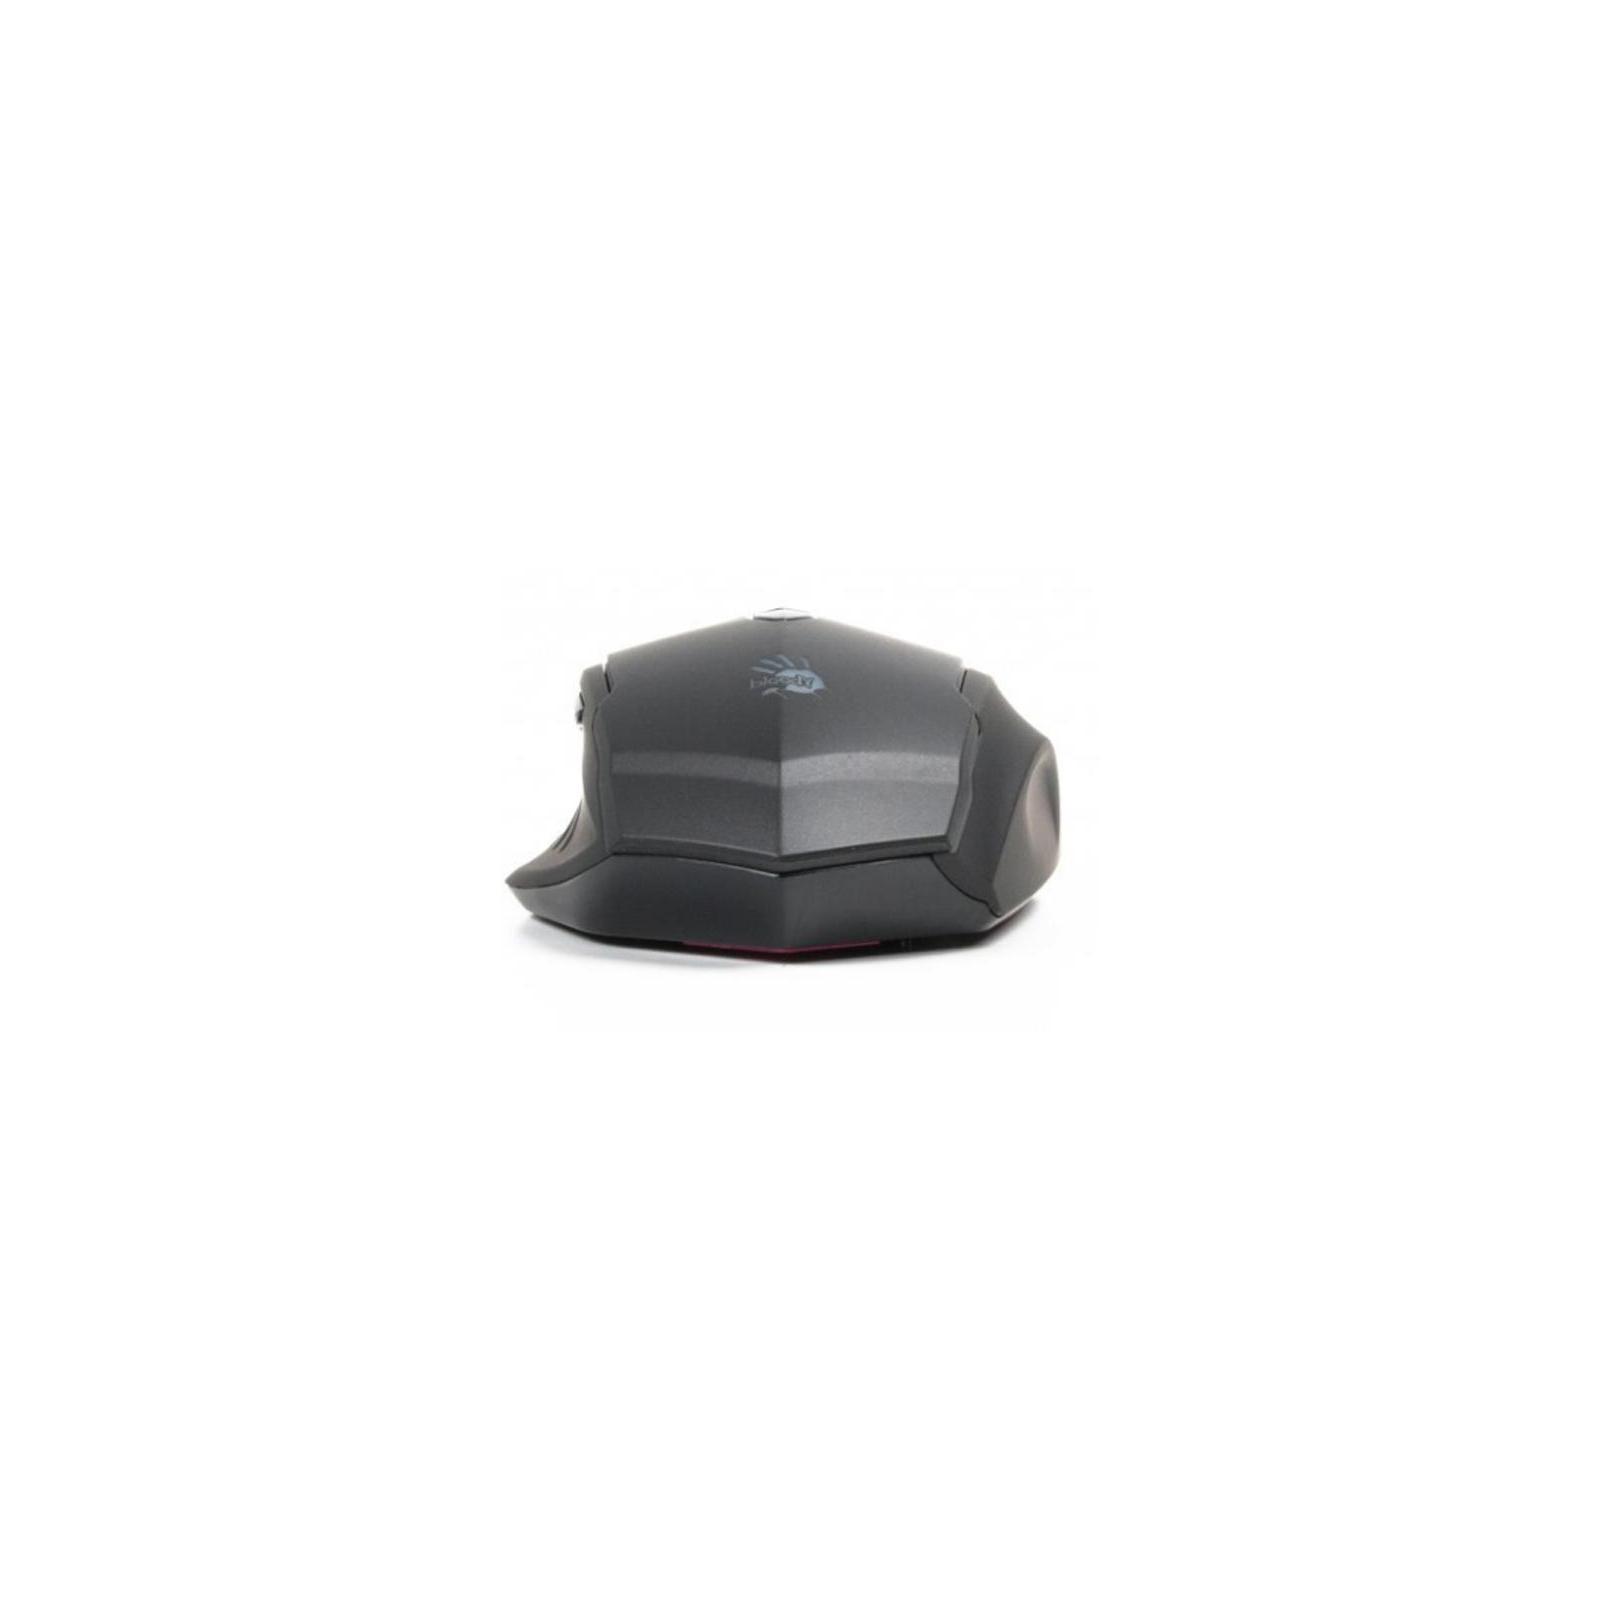 Мышка A4tech Bloody R70A Black изображение 8